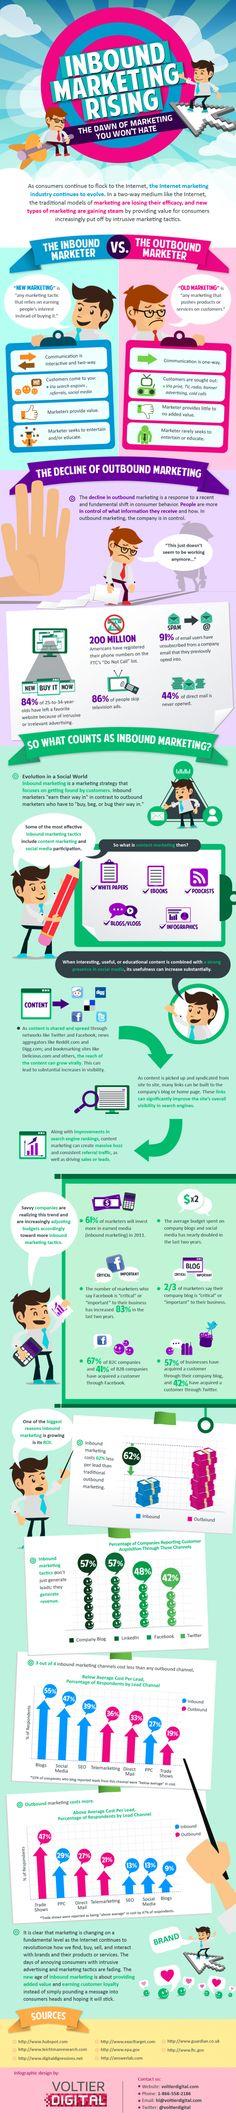 Interessante Infographic over Inbound Marketing vs Outbound Marketing.